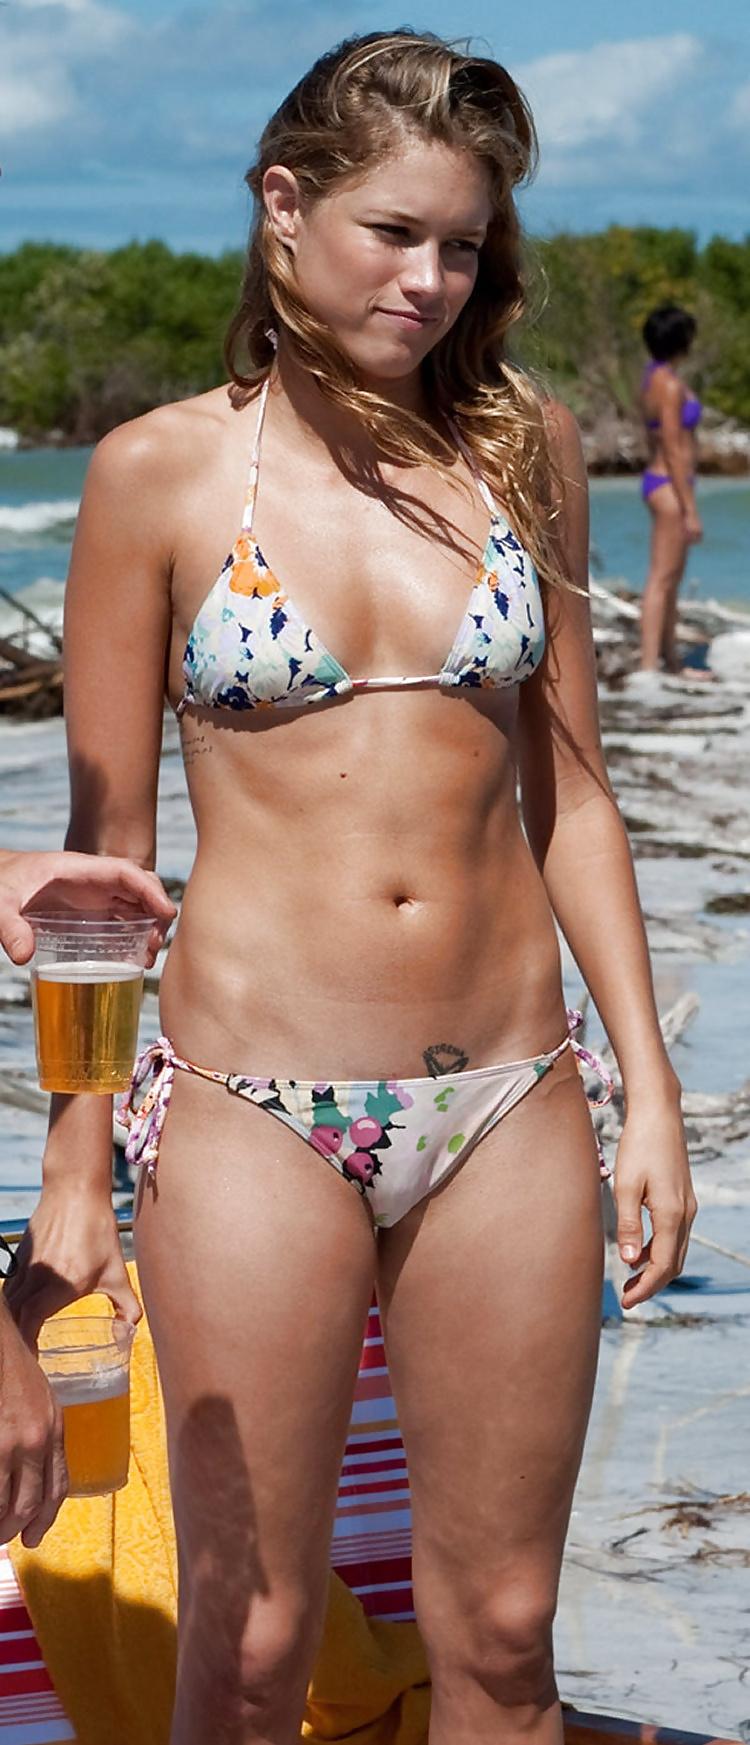 hairy-pussy-bikini-amateur